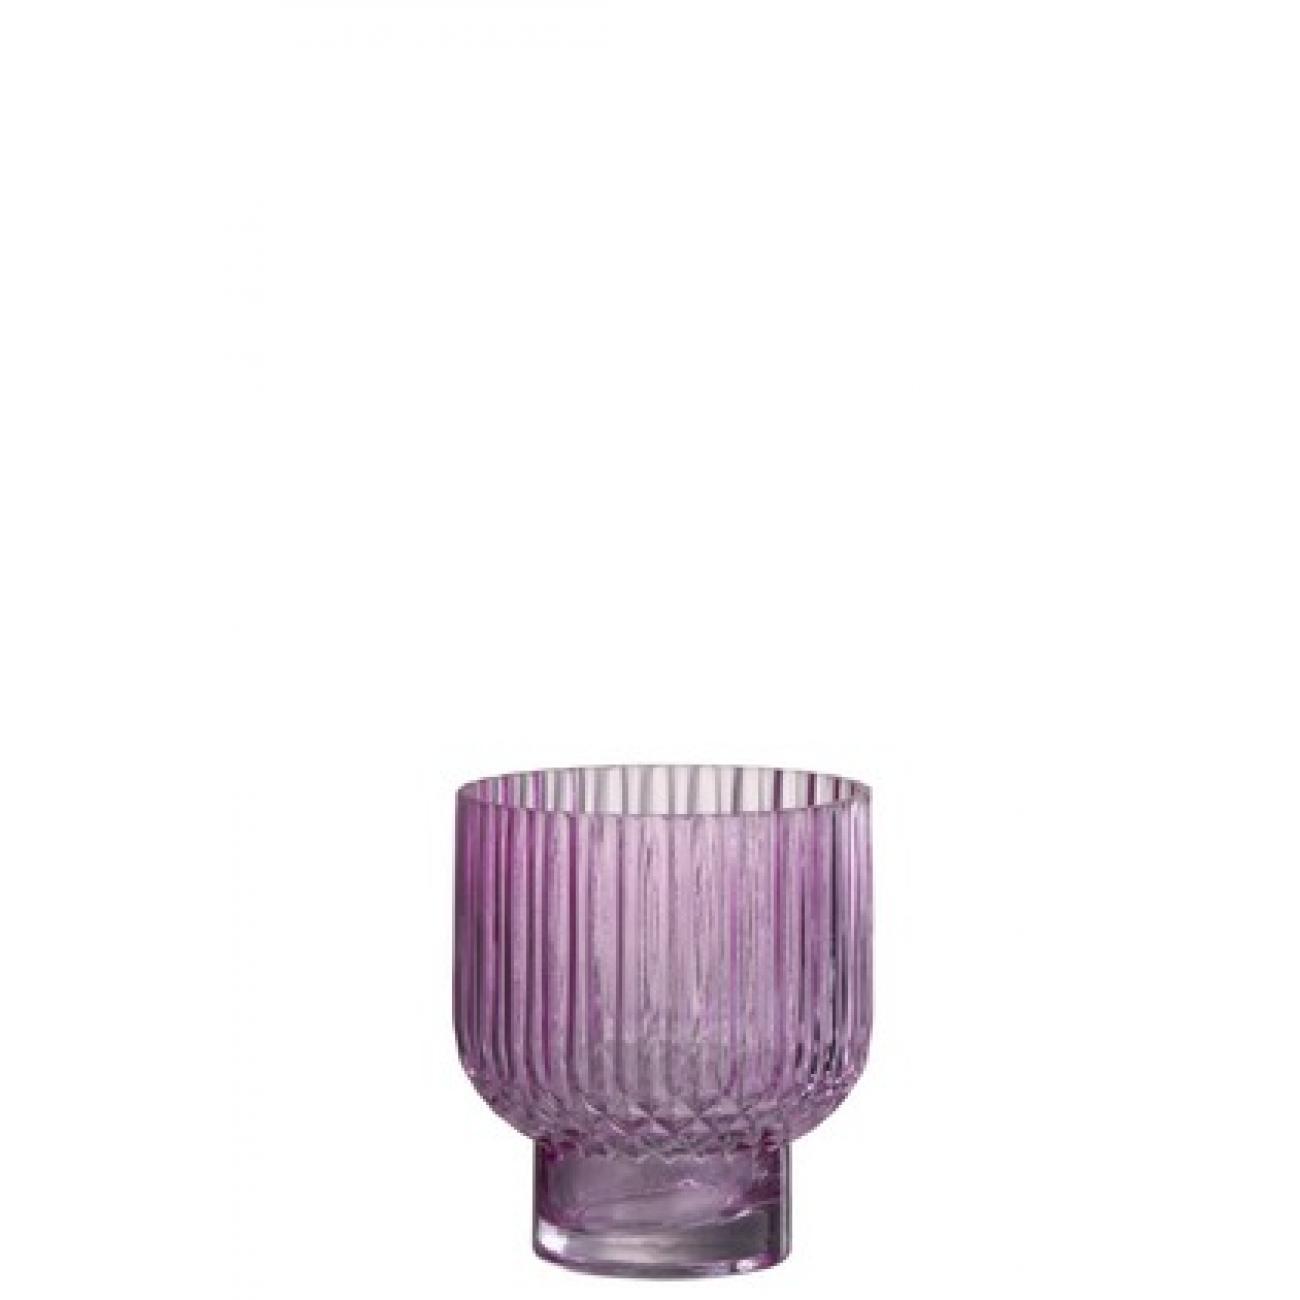 Ваза J-LINE  стеклянная  розовая рельефная 16 см